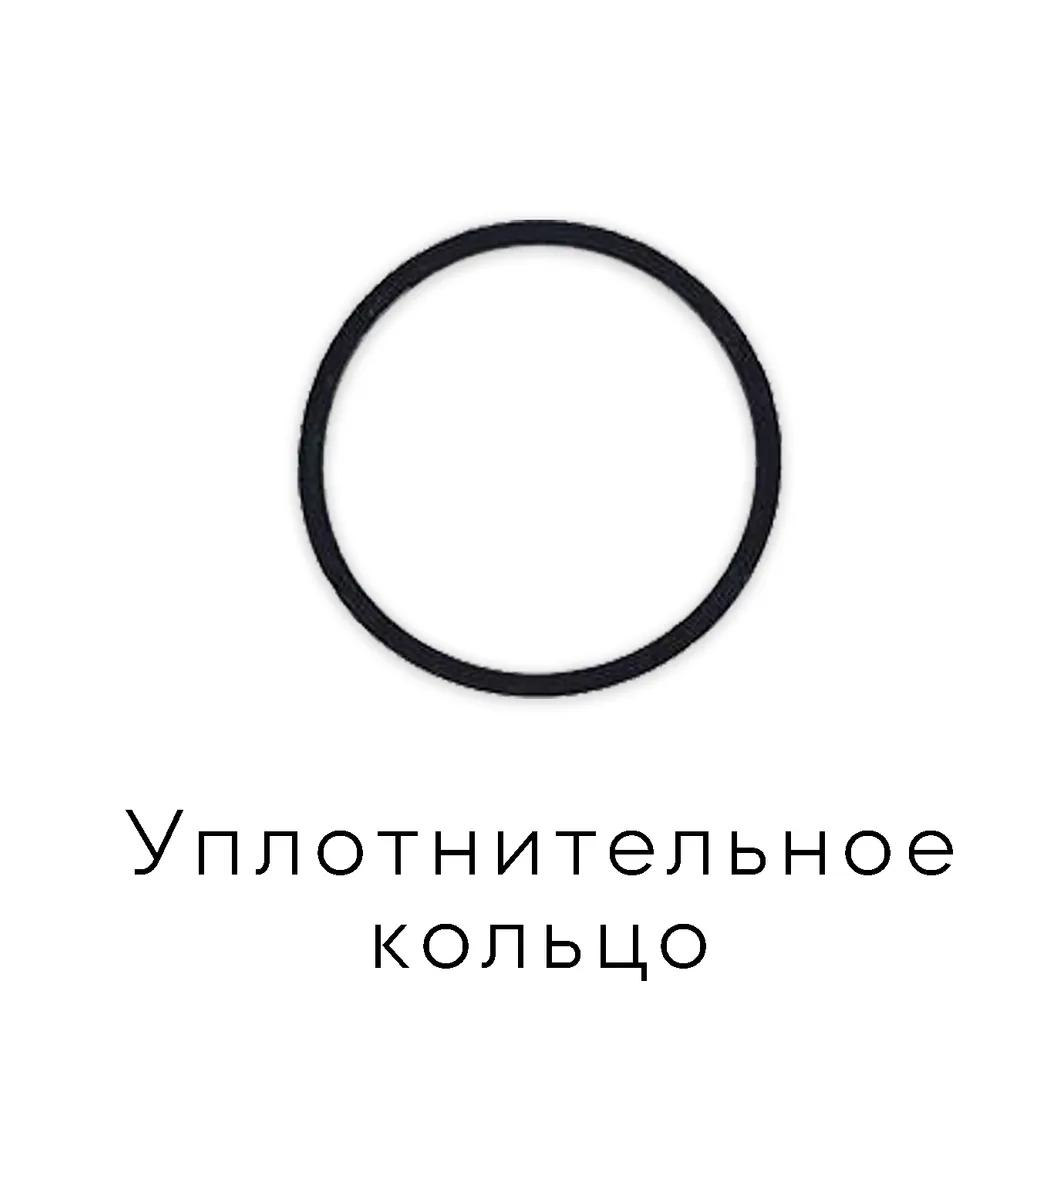 Автоклав для консервирования Белорусский 18 литров НЗГА - фото 18640